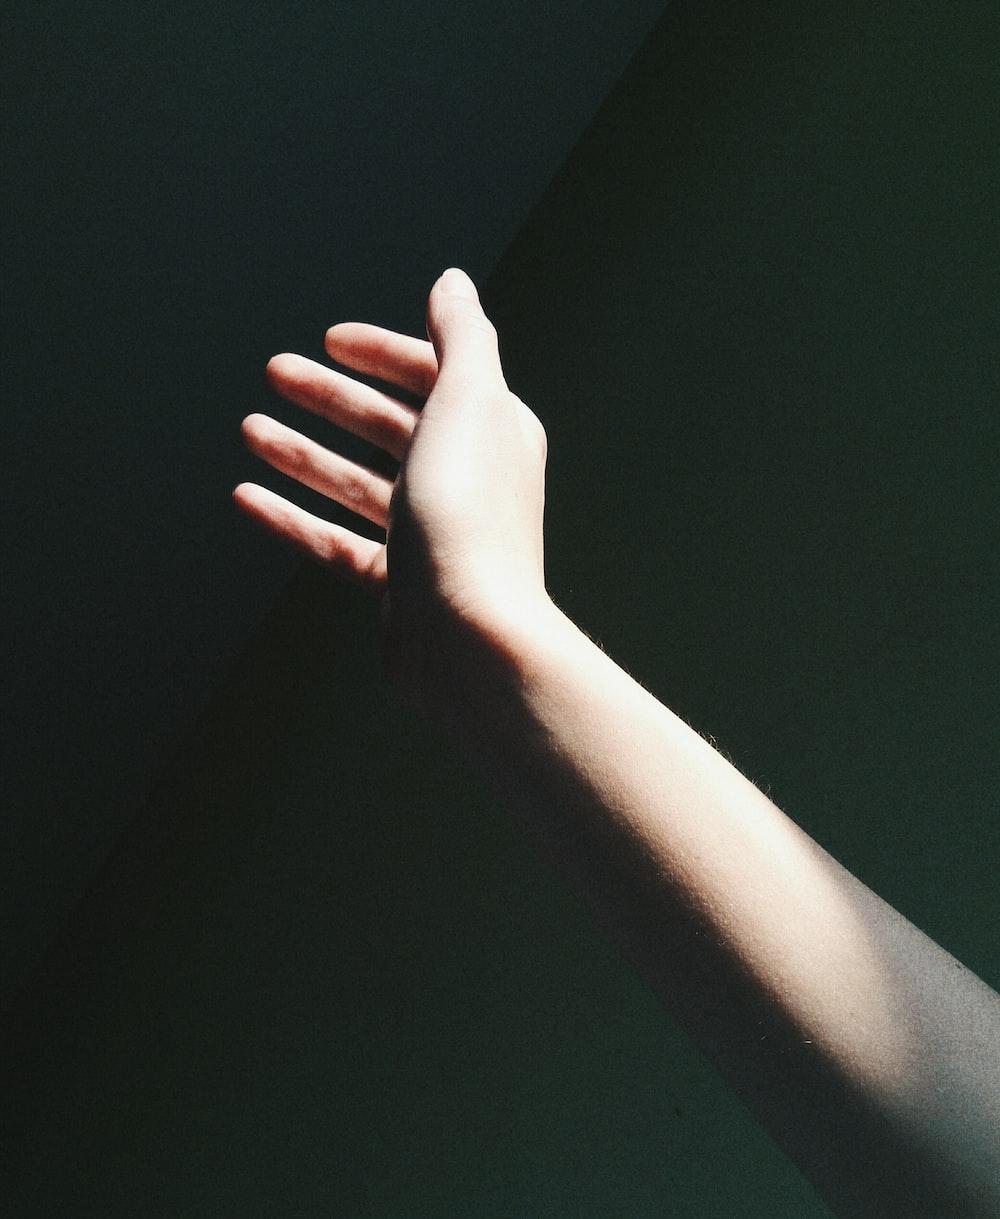 person right hand